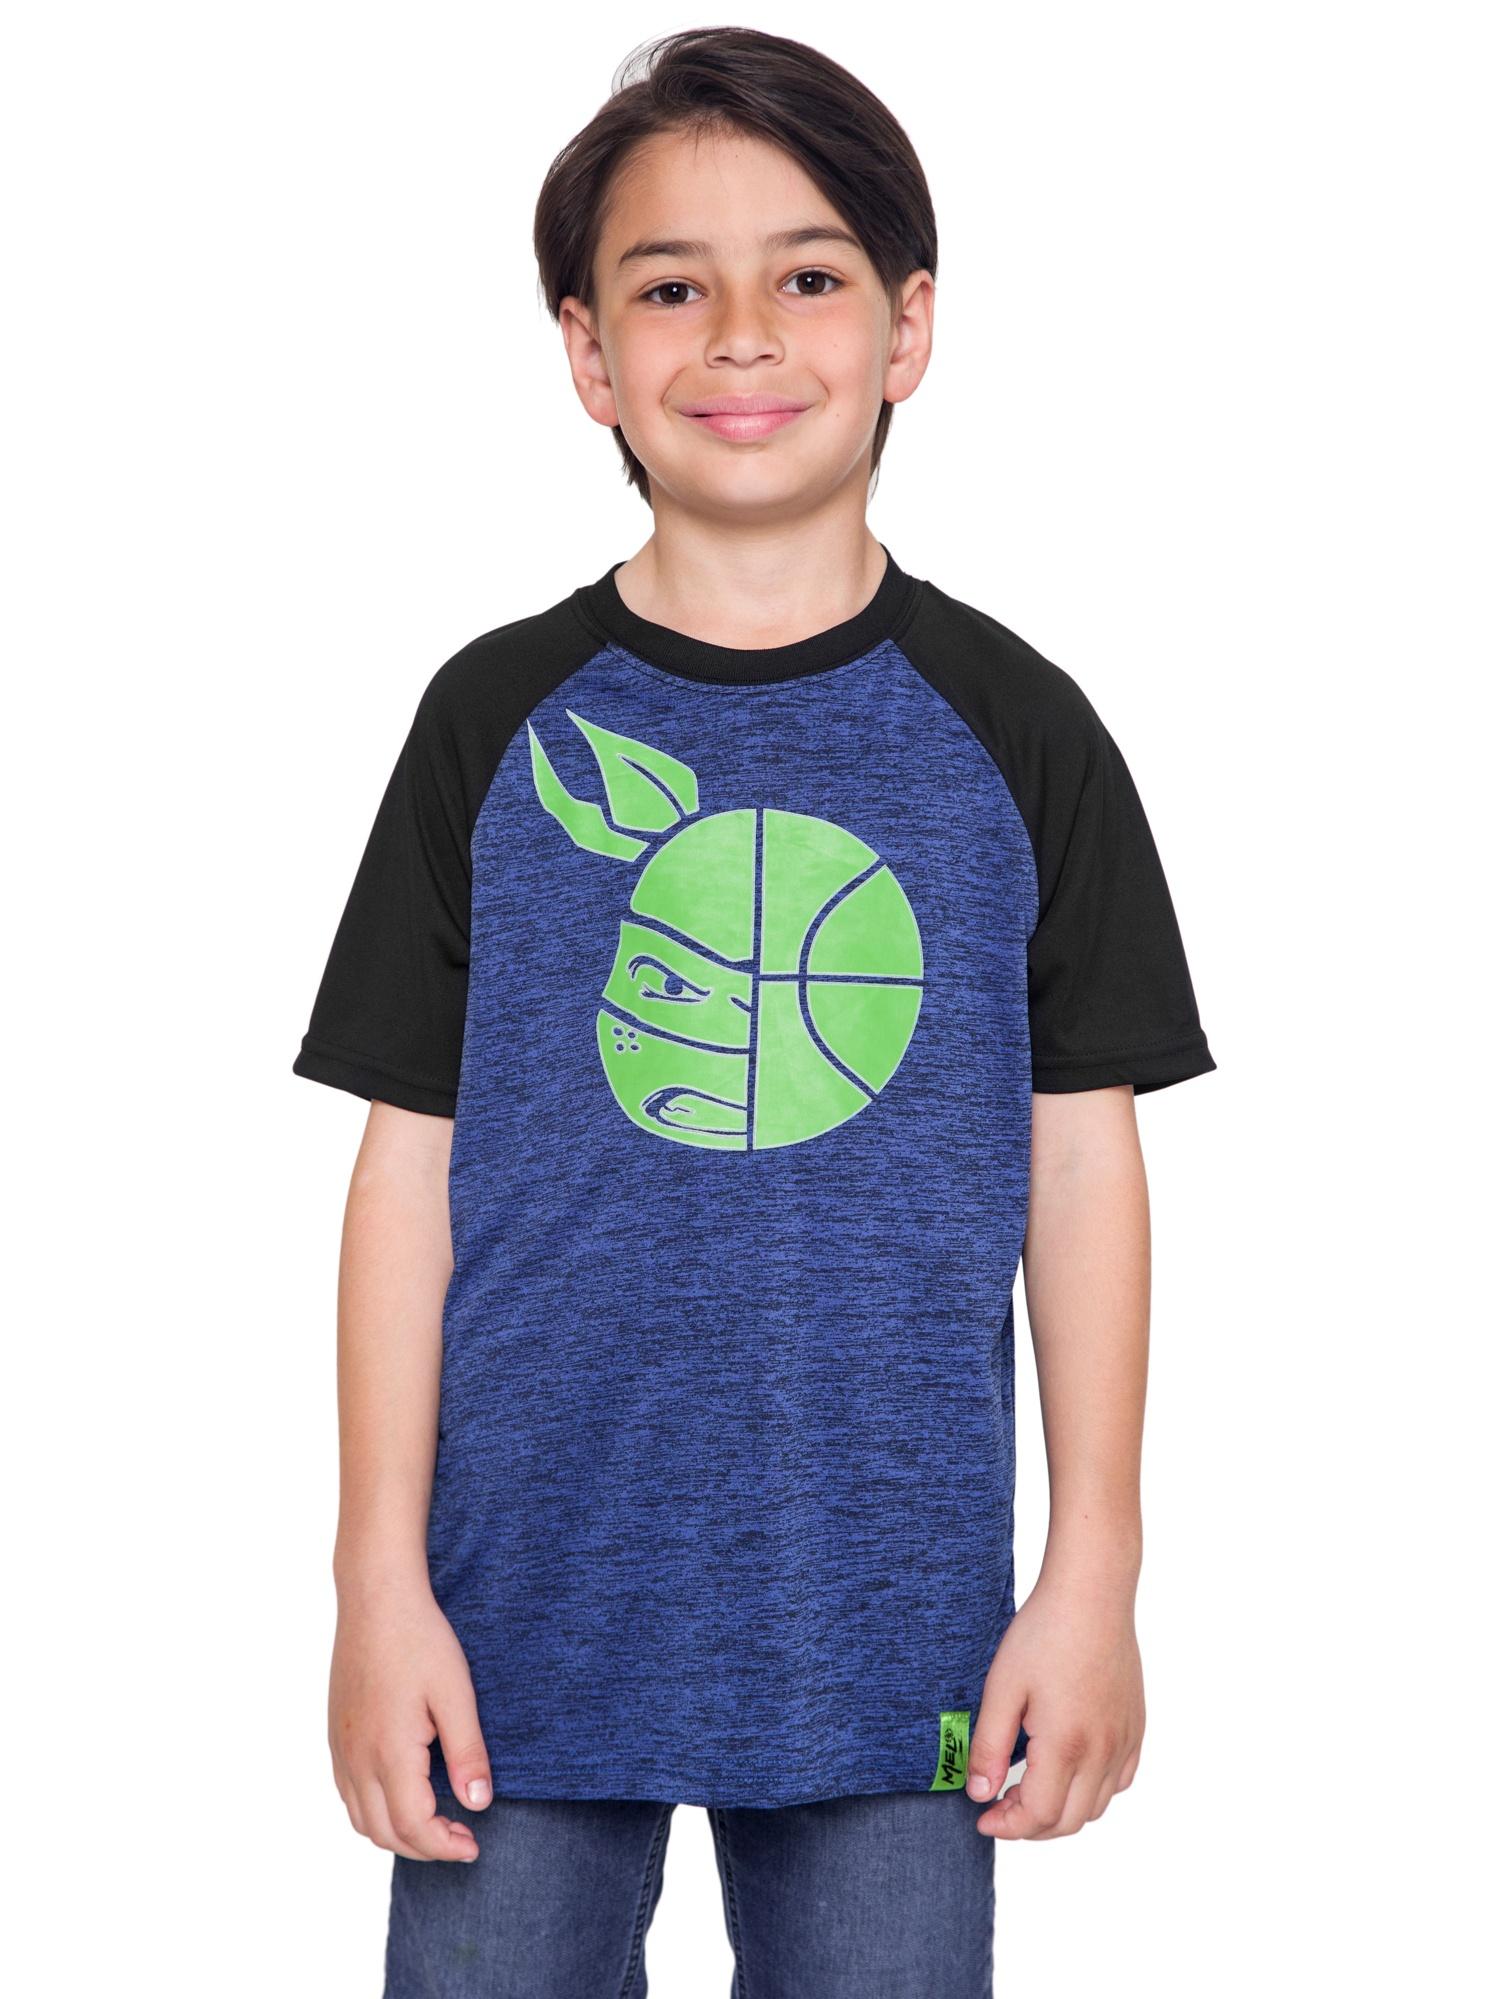 Youth Boys Teenage Mutant Ninja Turtles T-Shirt - Rash Guard Quick-Dry